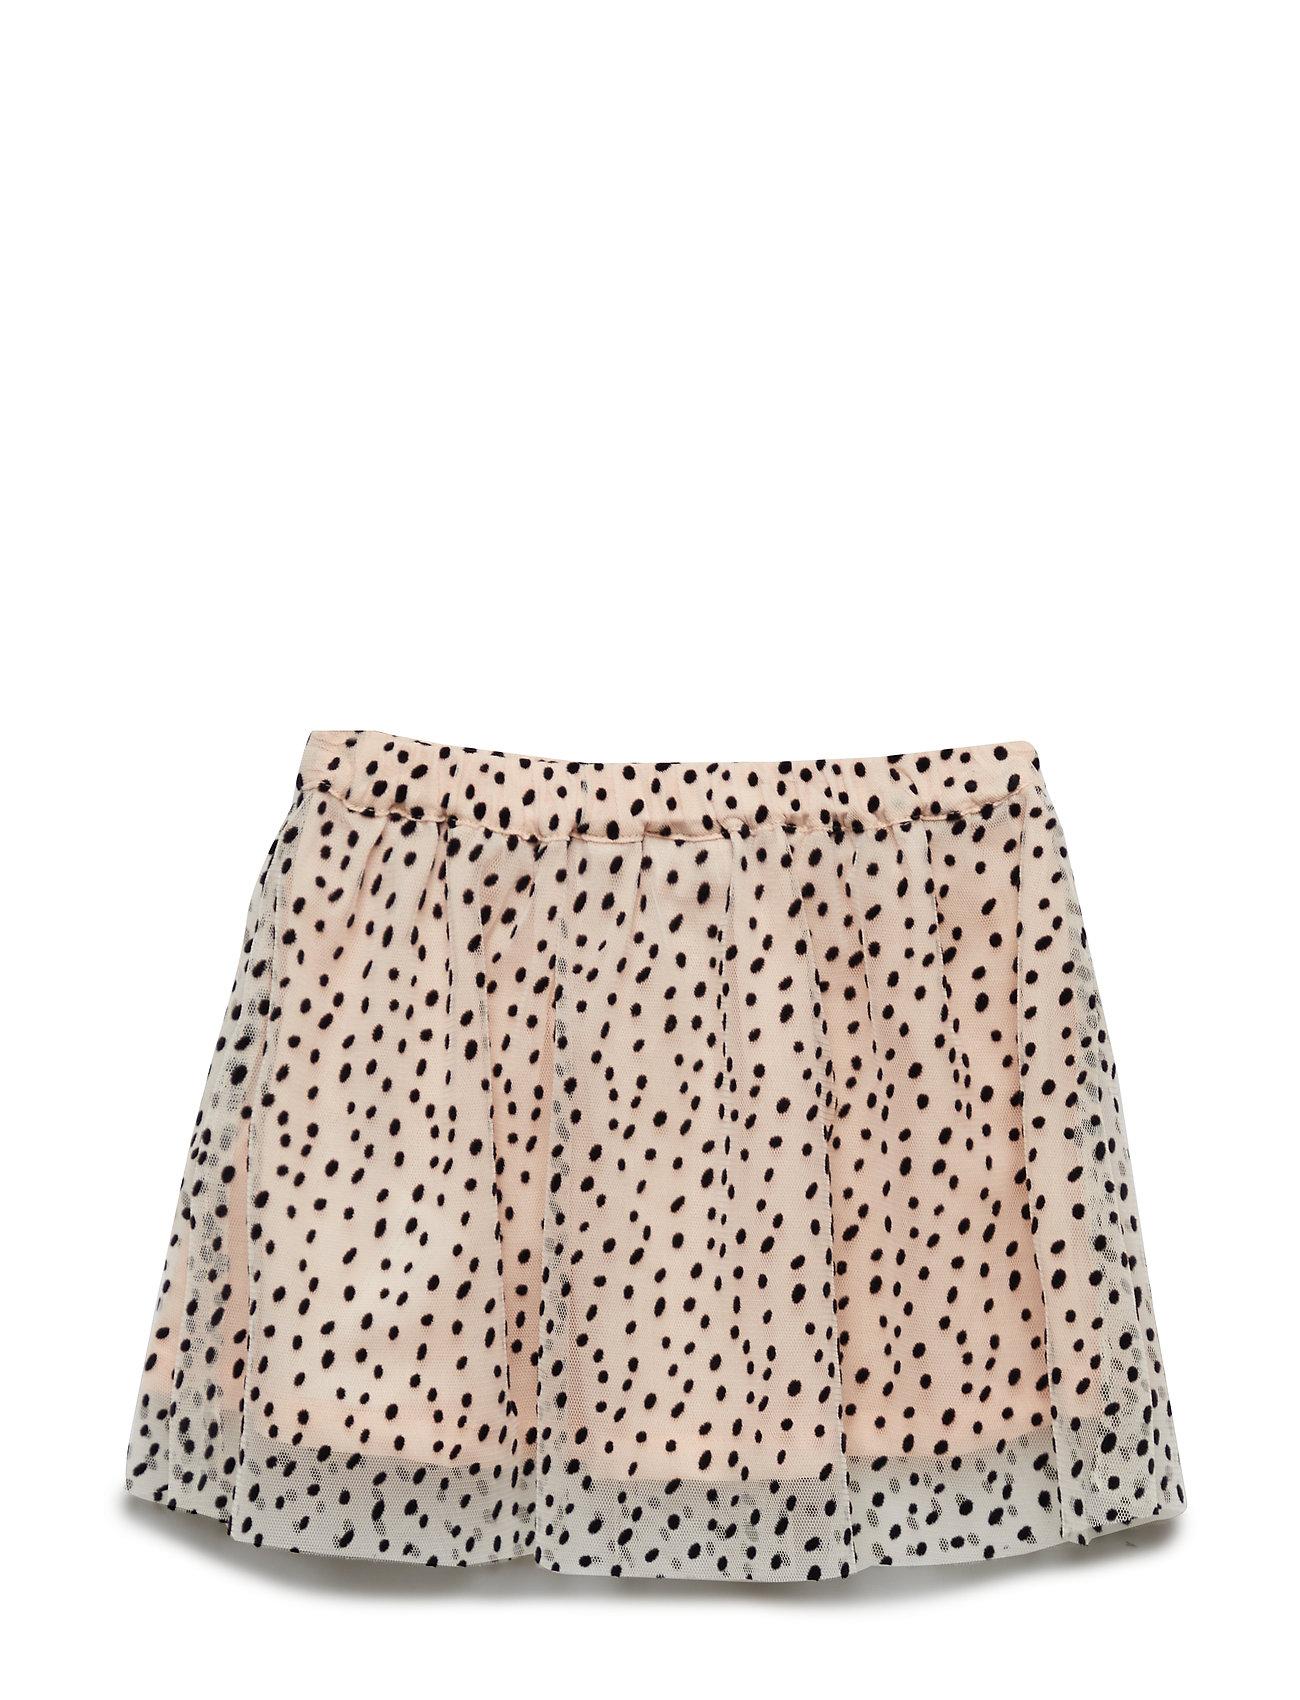 da0d07b4064 Noa Noa Miniature nederdele – Skirt til børn i ALESAN - Pashion.dk